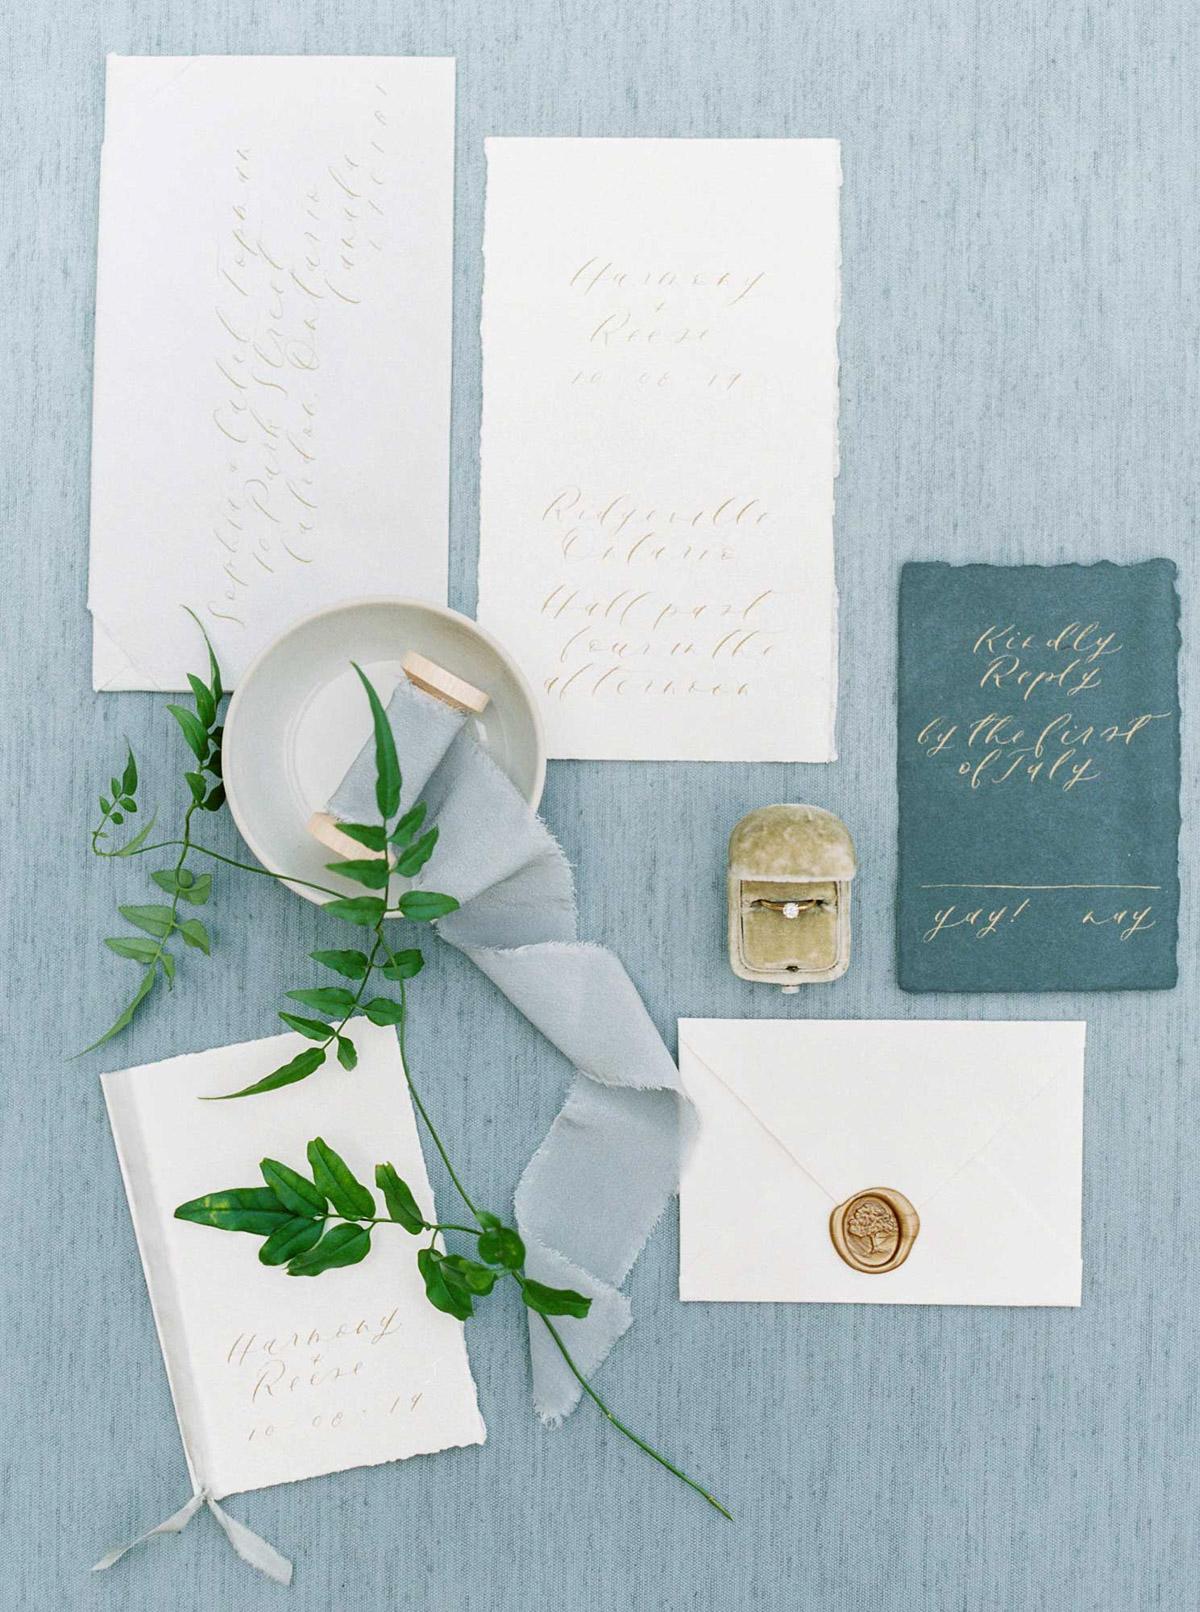 kayla-yestal-vineyard-bride-swish-list-woodland-weddings-niagara-wedding-editorial-2.jpg